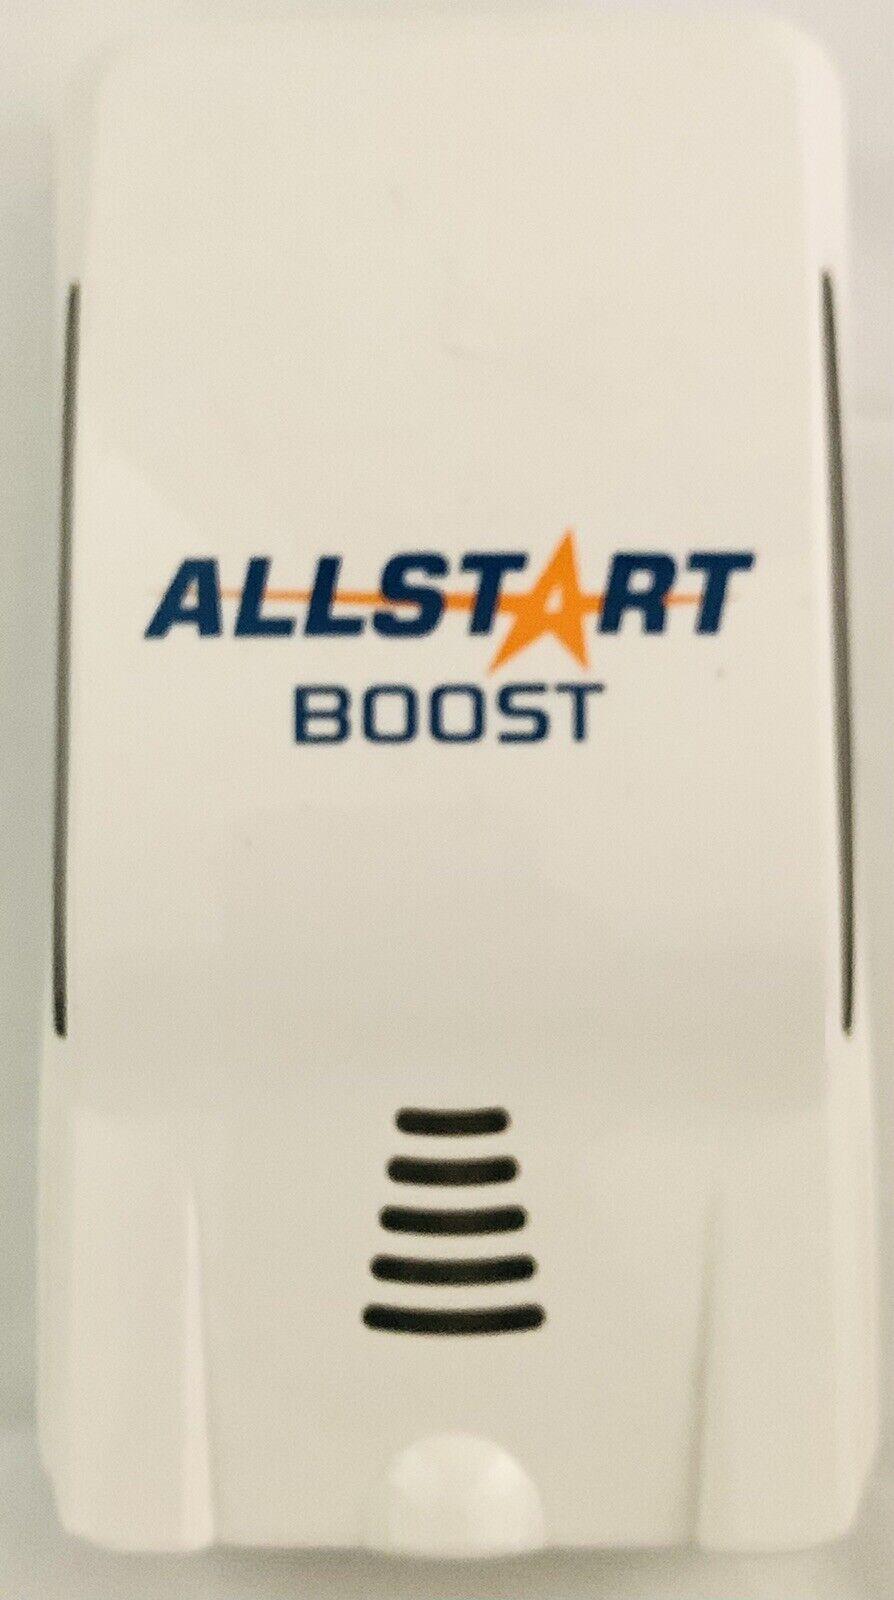 Allstart 550 Portable Power Source with Jump Start Function